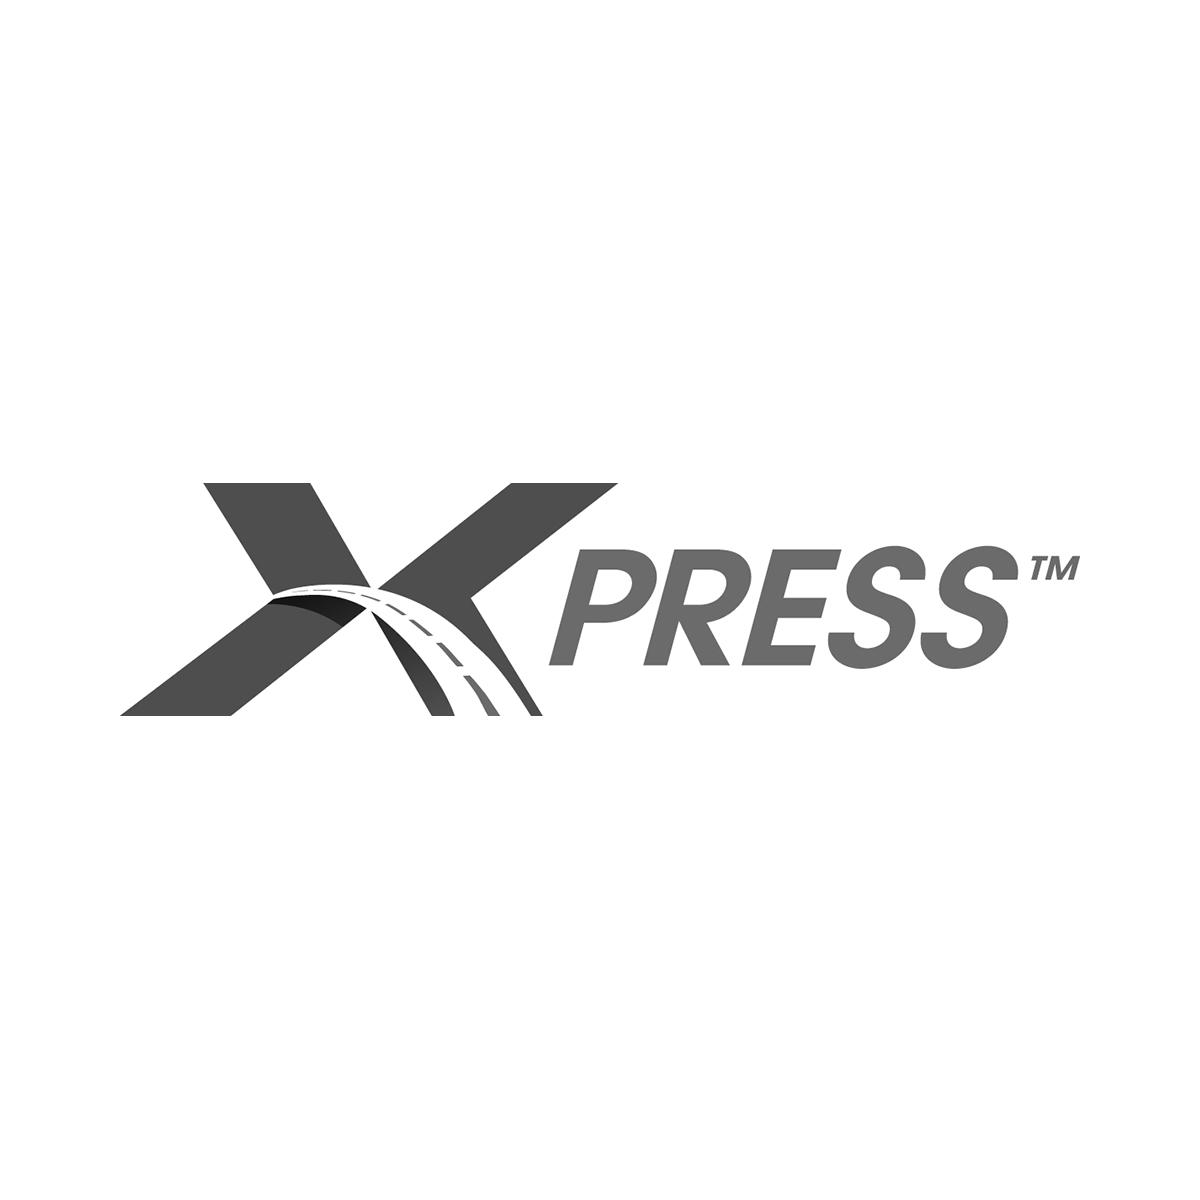 Xpress Car Dealership Software